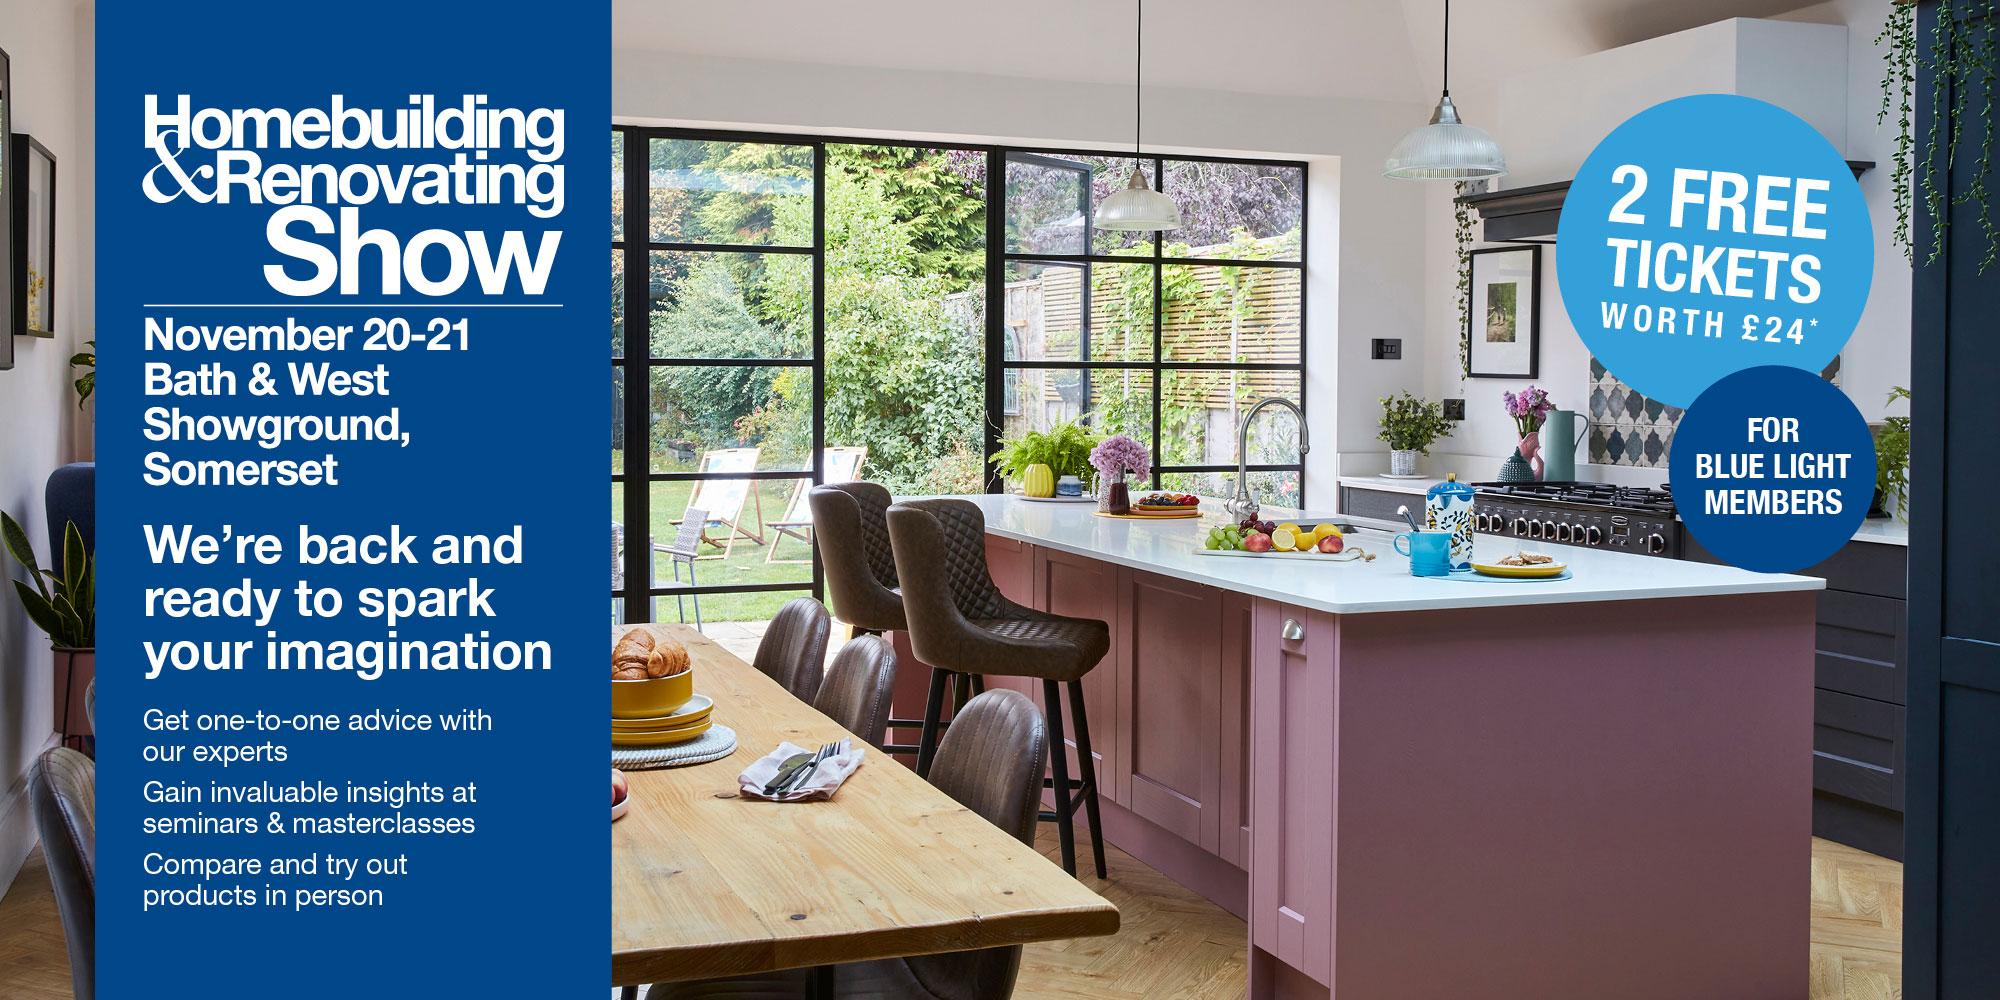 Homebuilding & Renovating Show - West